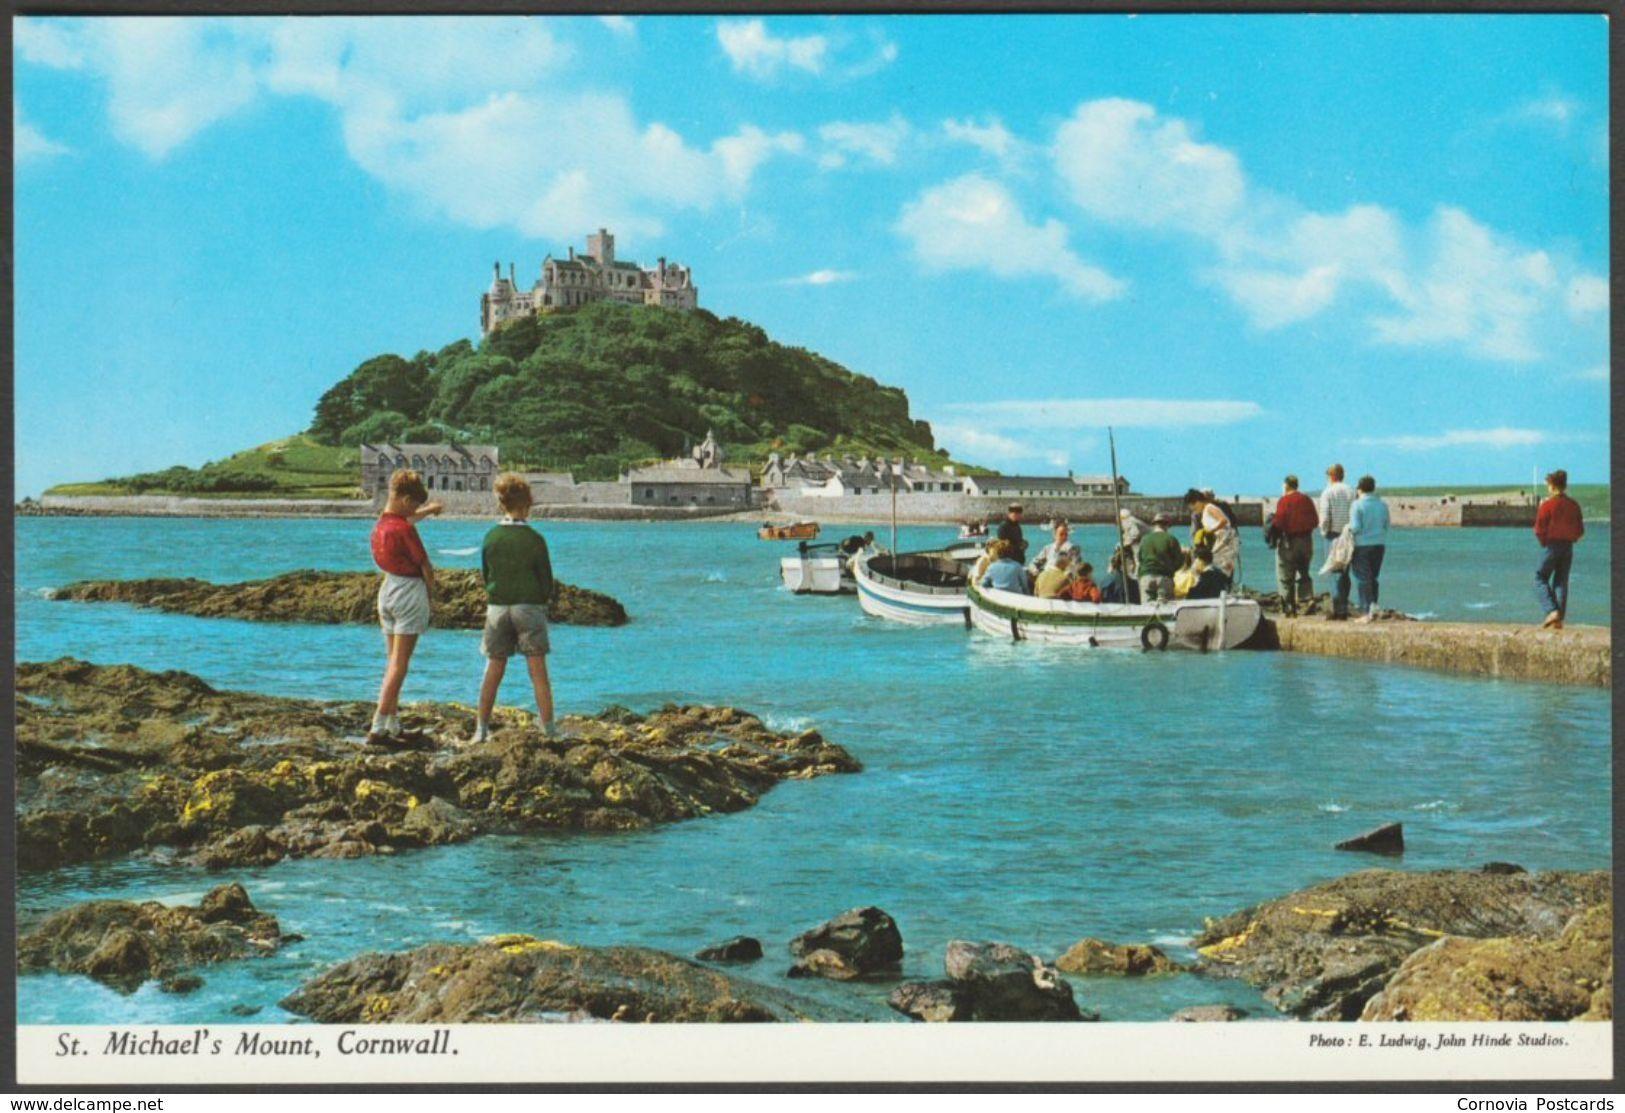 St Michael's Mount, Cornwall, c.1980 - John Hinde Postcard